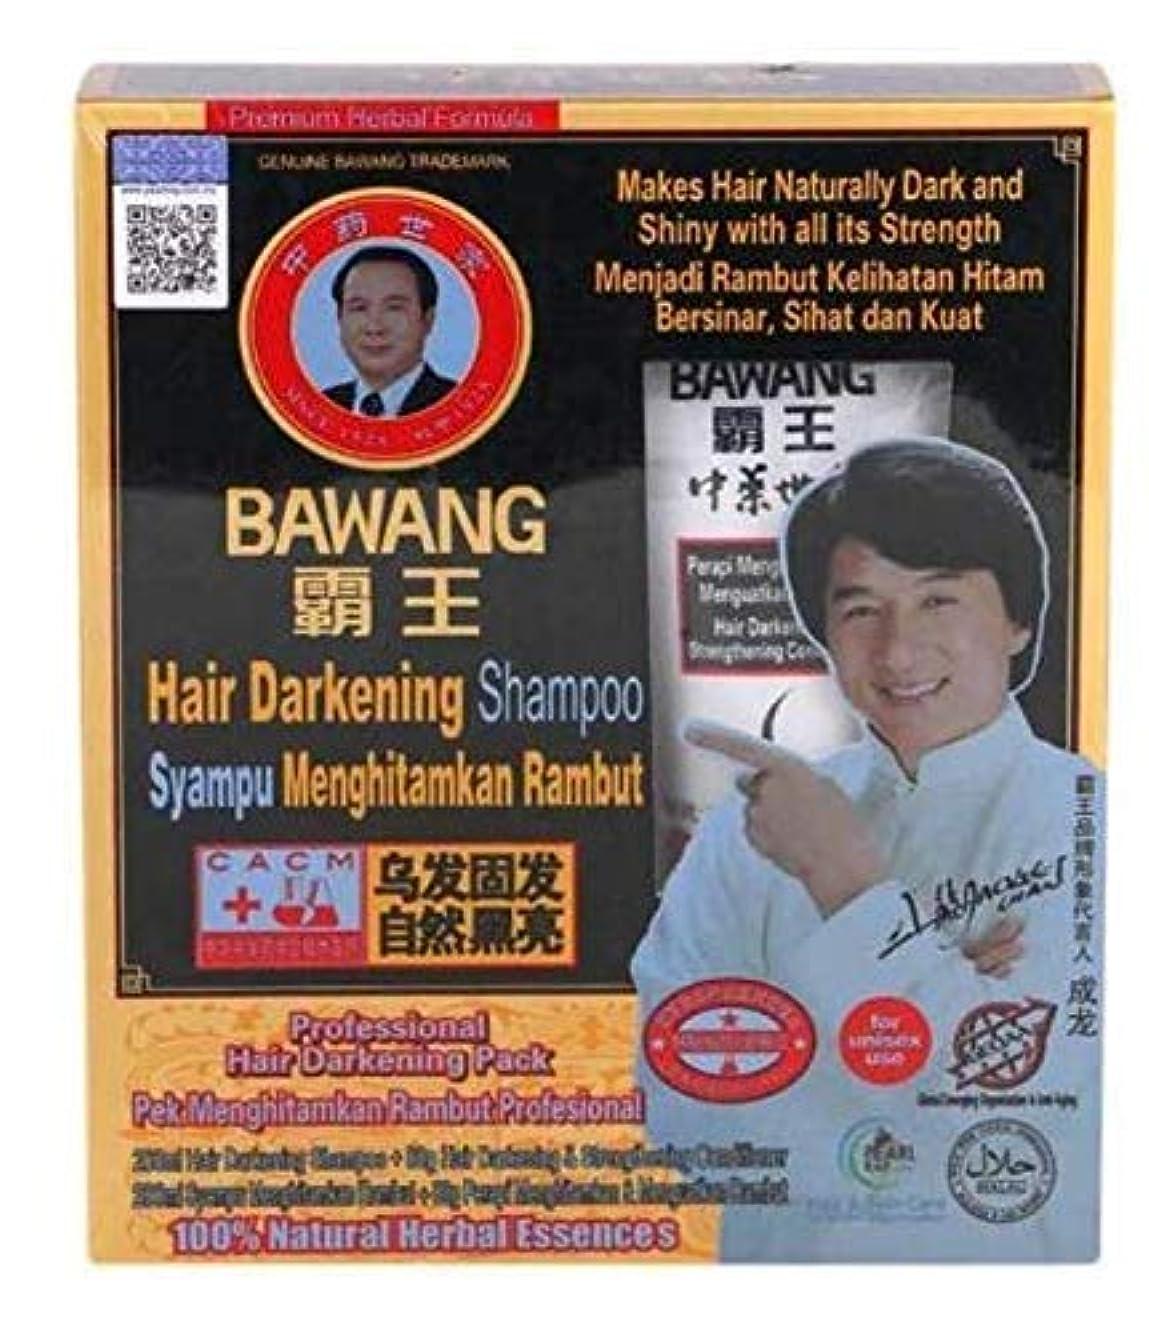 BAWANG プロフェッショナル髪黒い袋200ミリリットル+ 80グラム